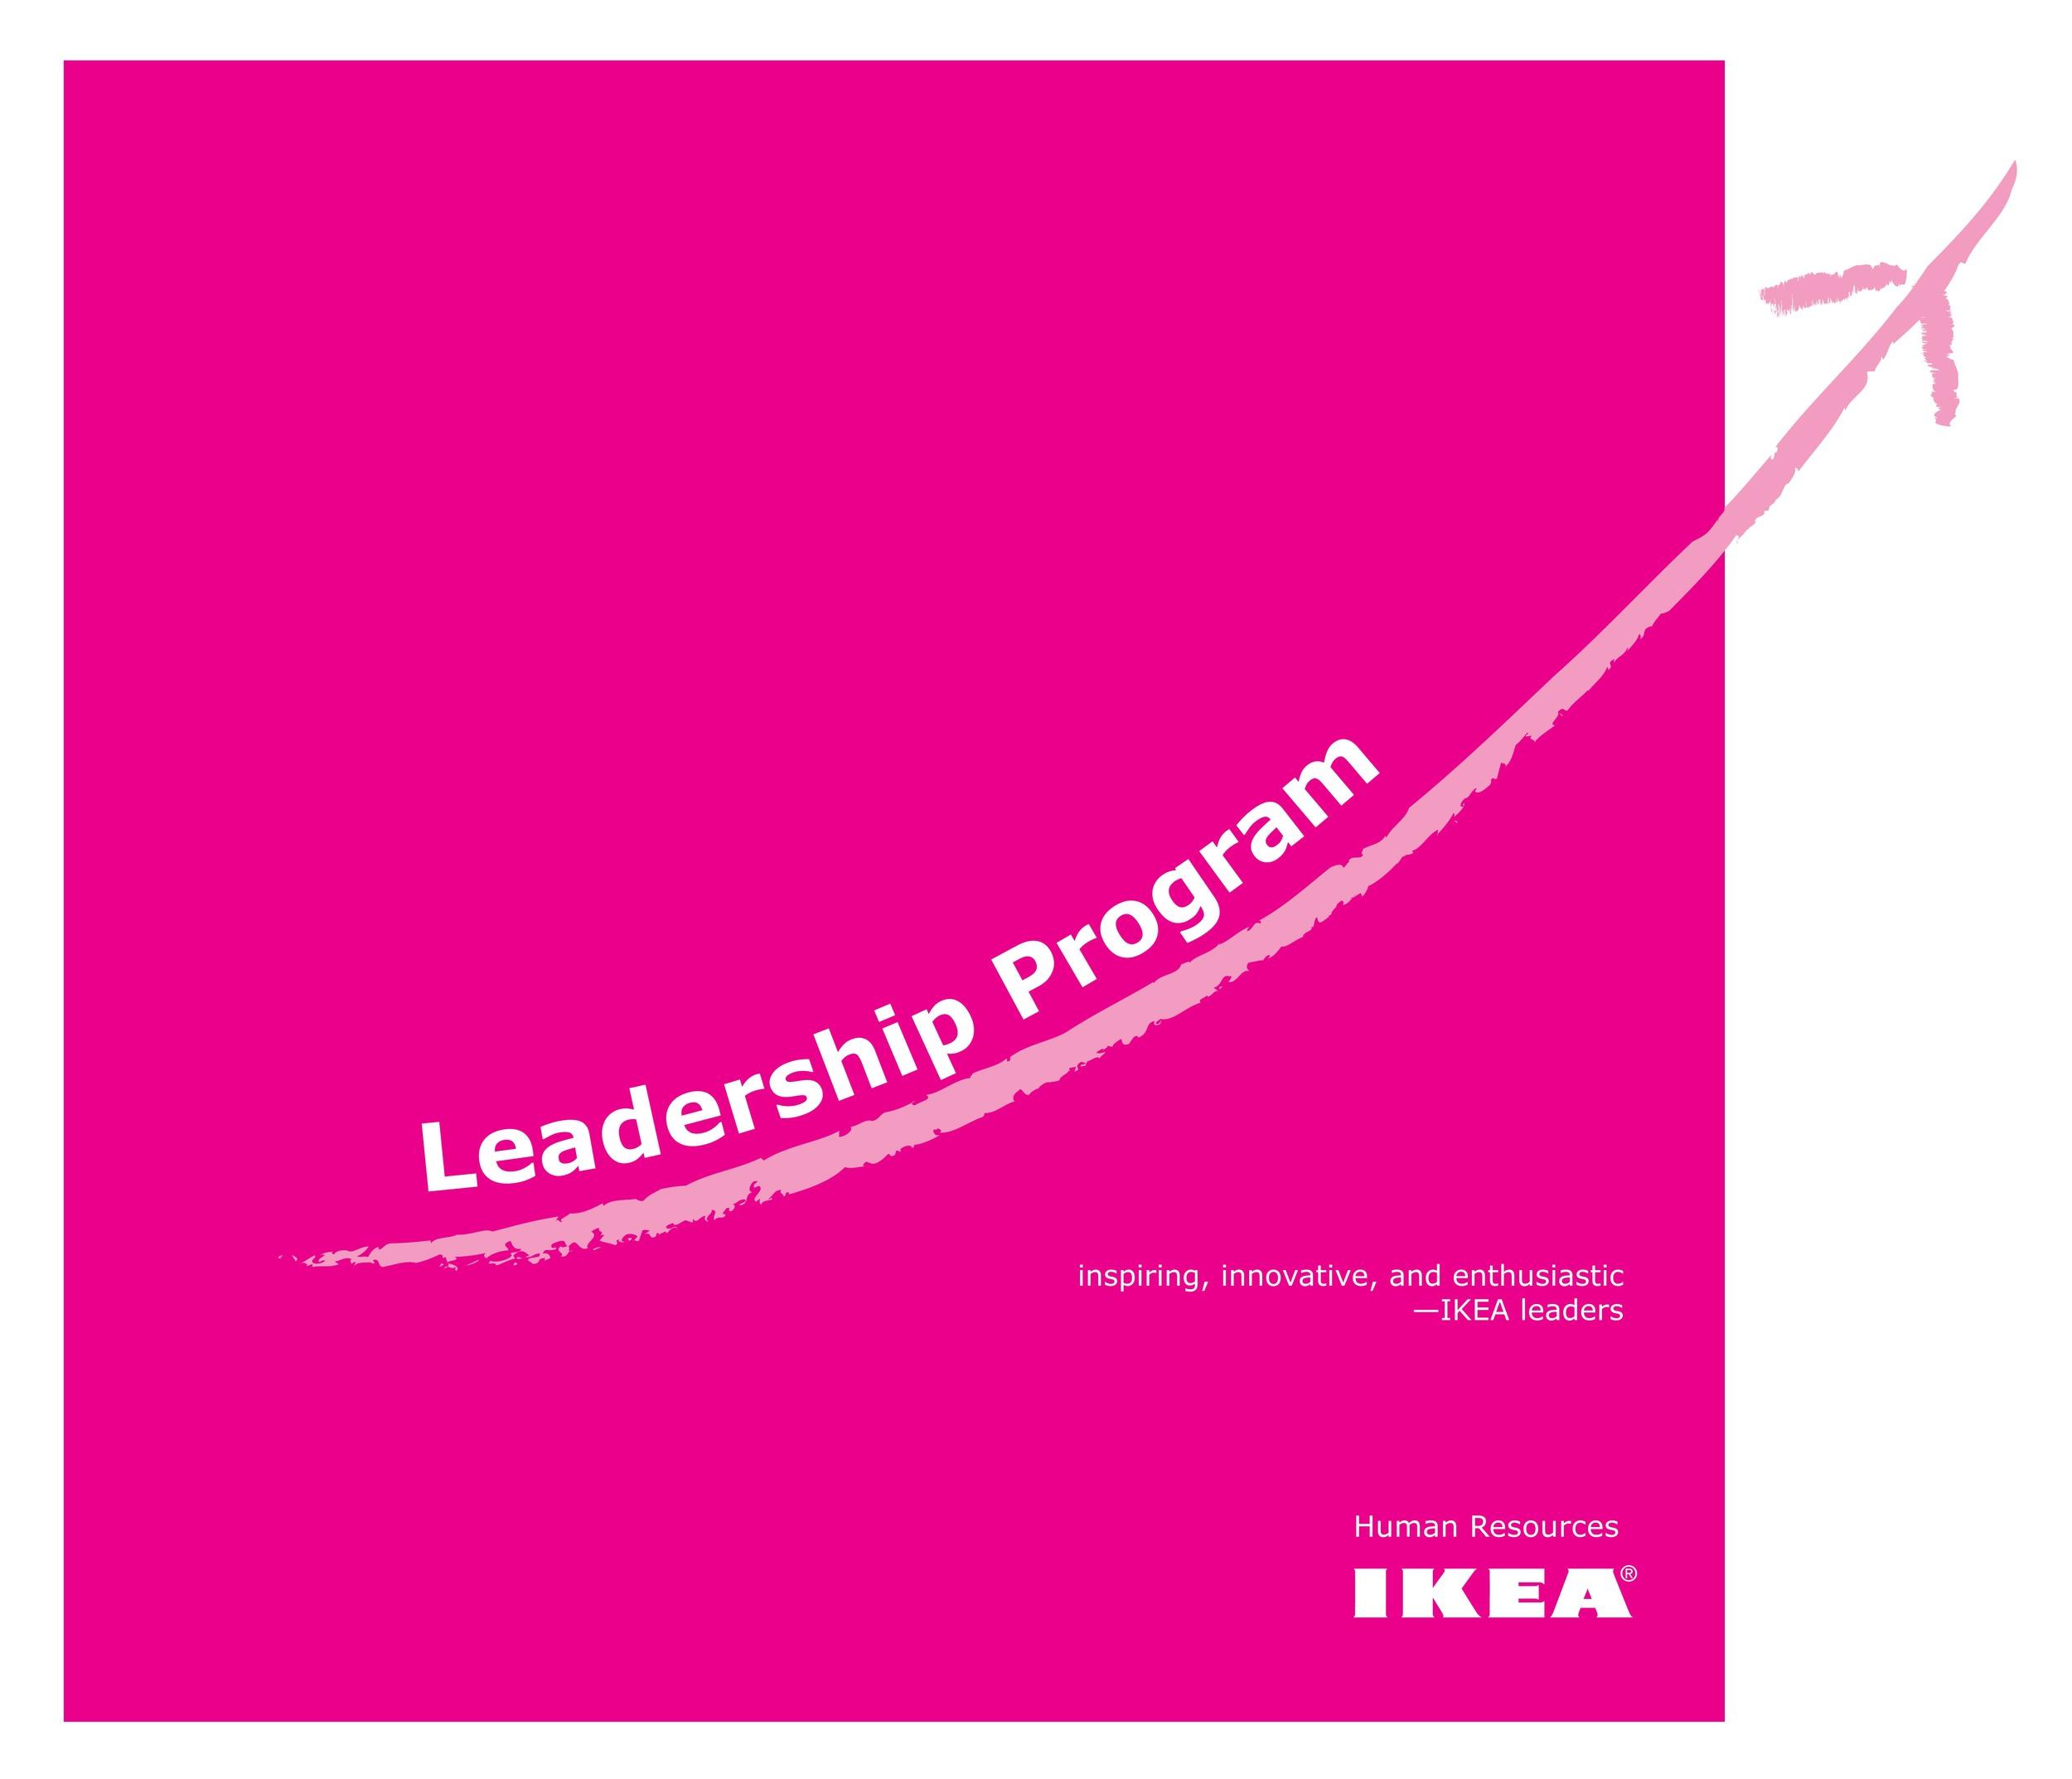 leadership program logo.jpg